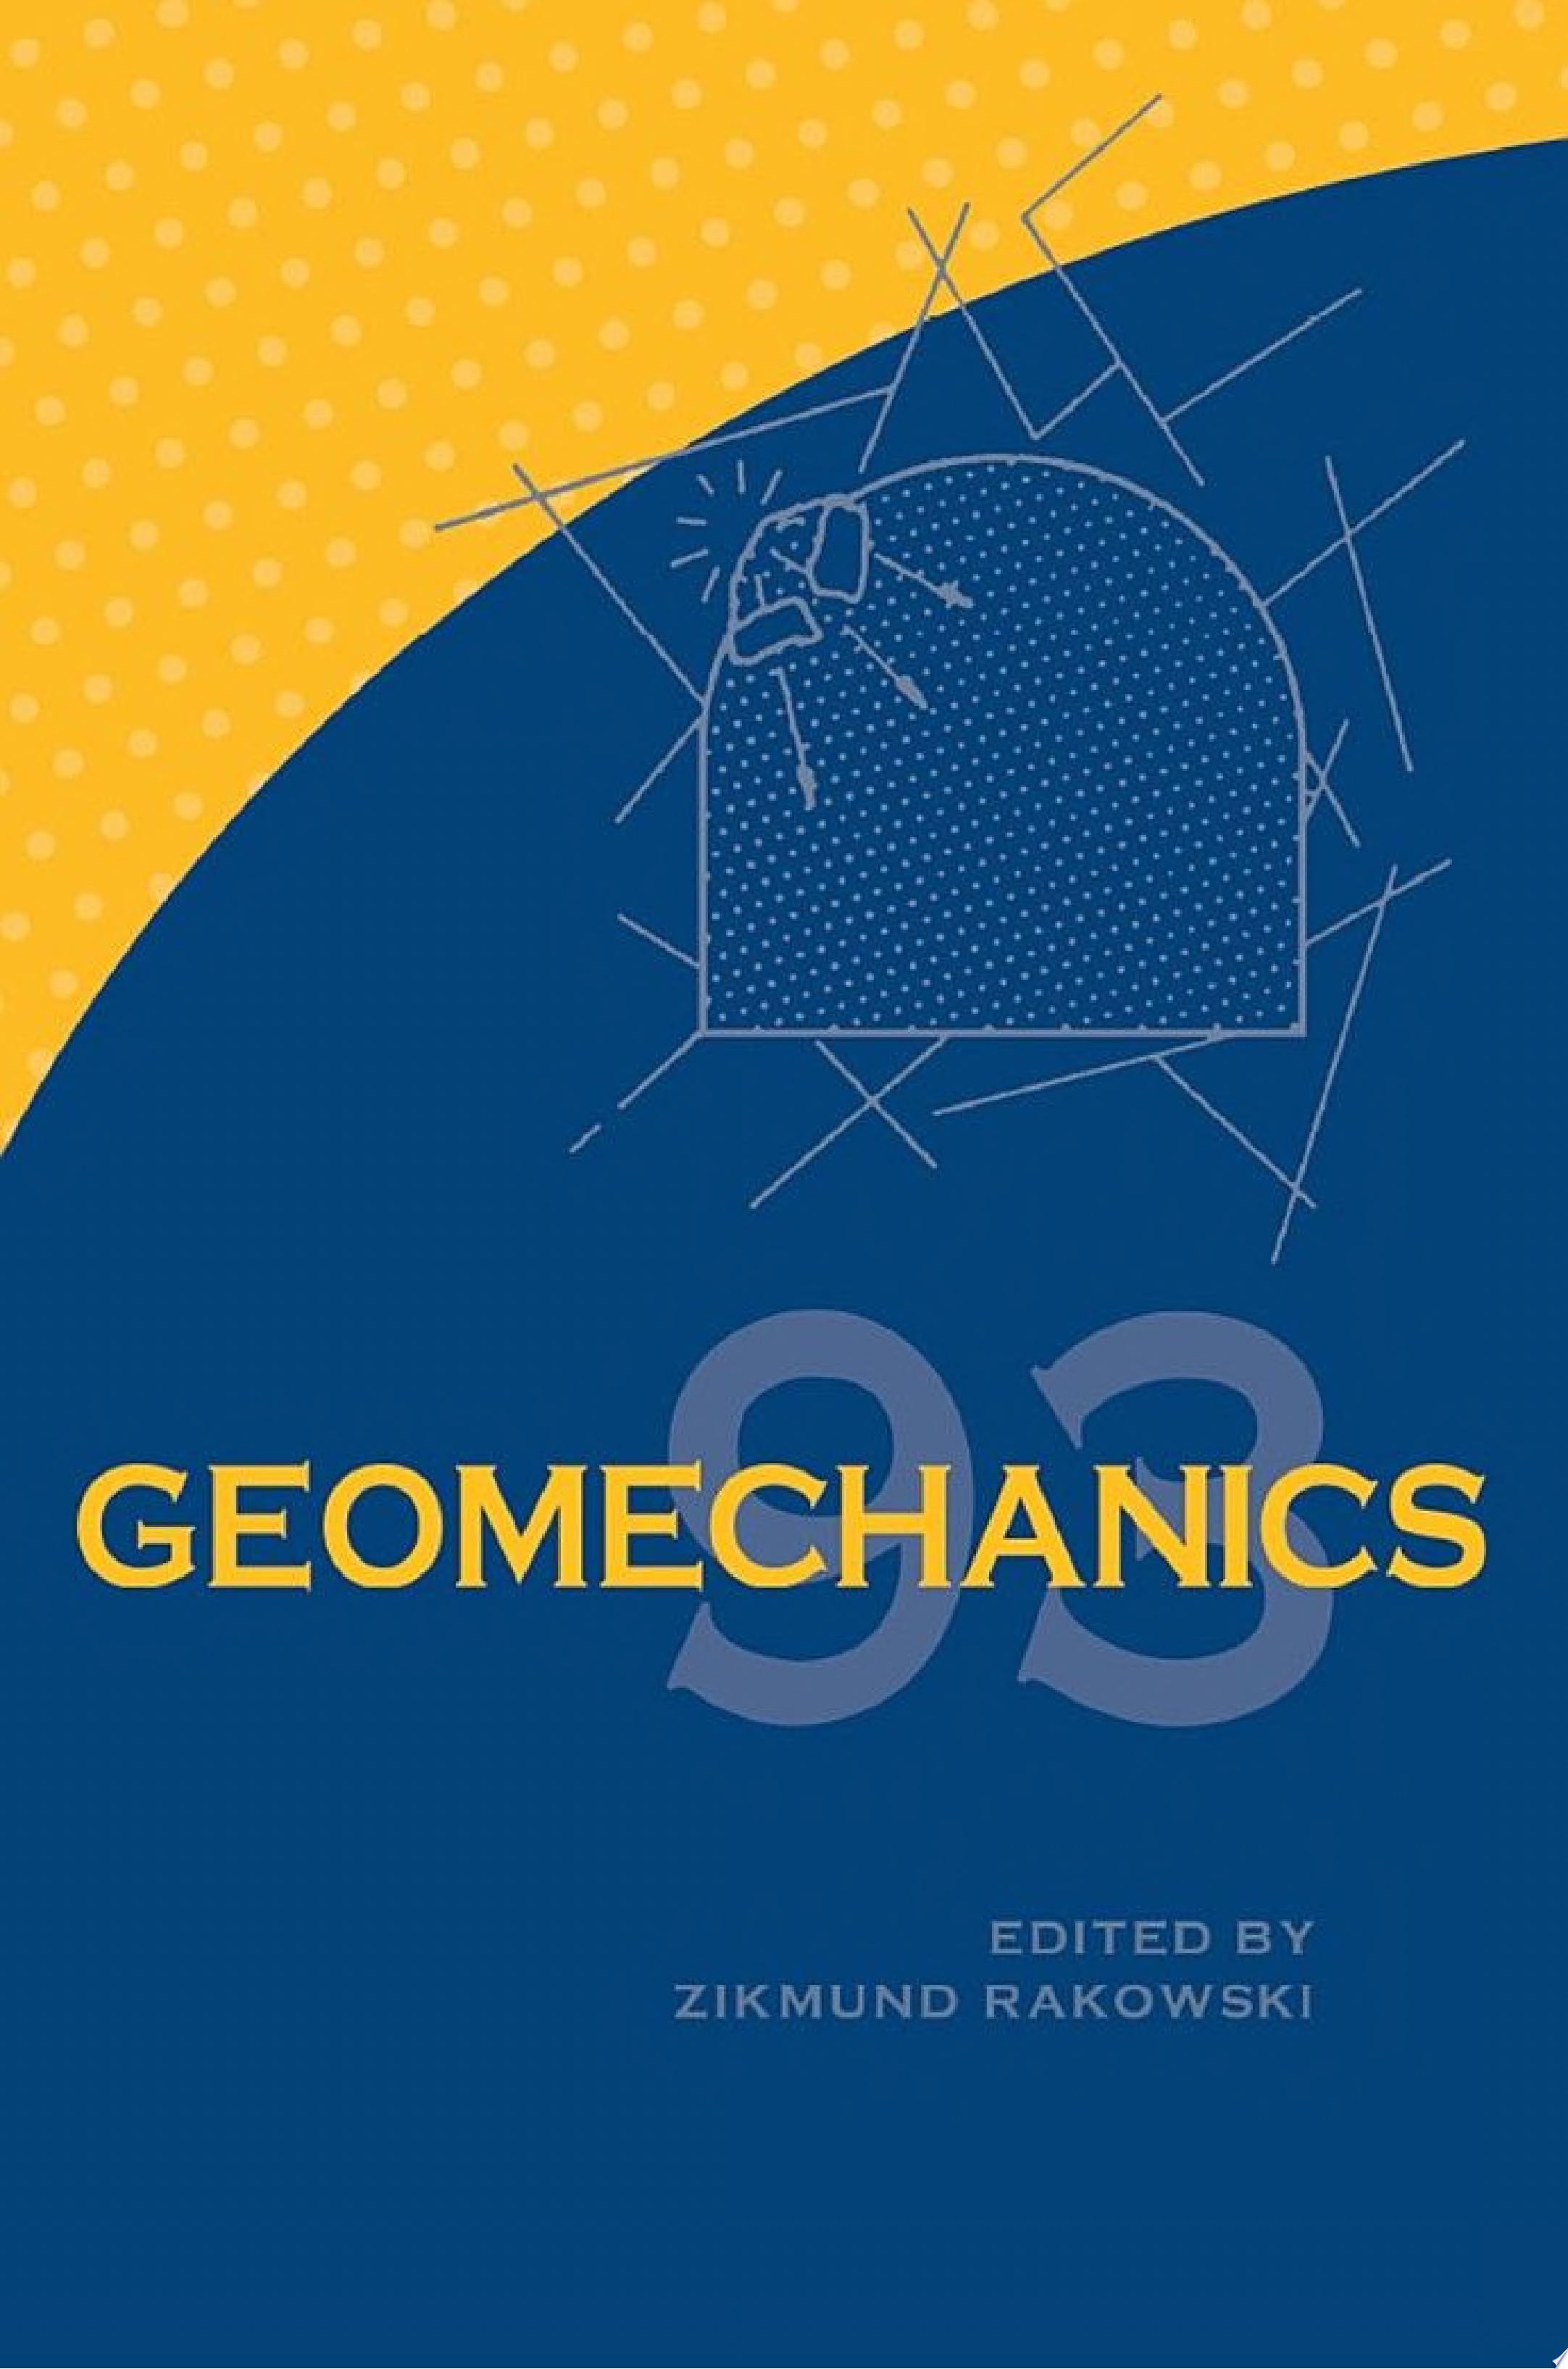 Geomechanics 93   Strata Mechanics  Numerical Methods Water Jet Cutting